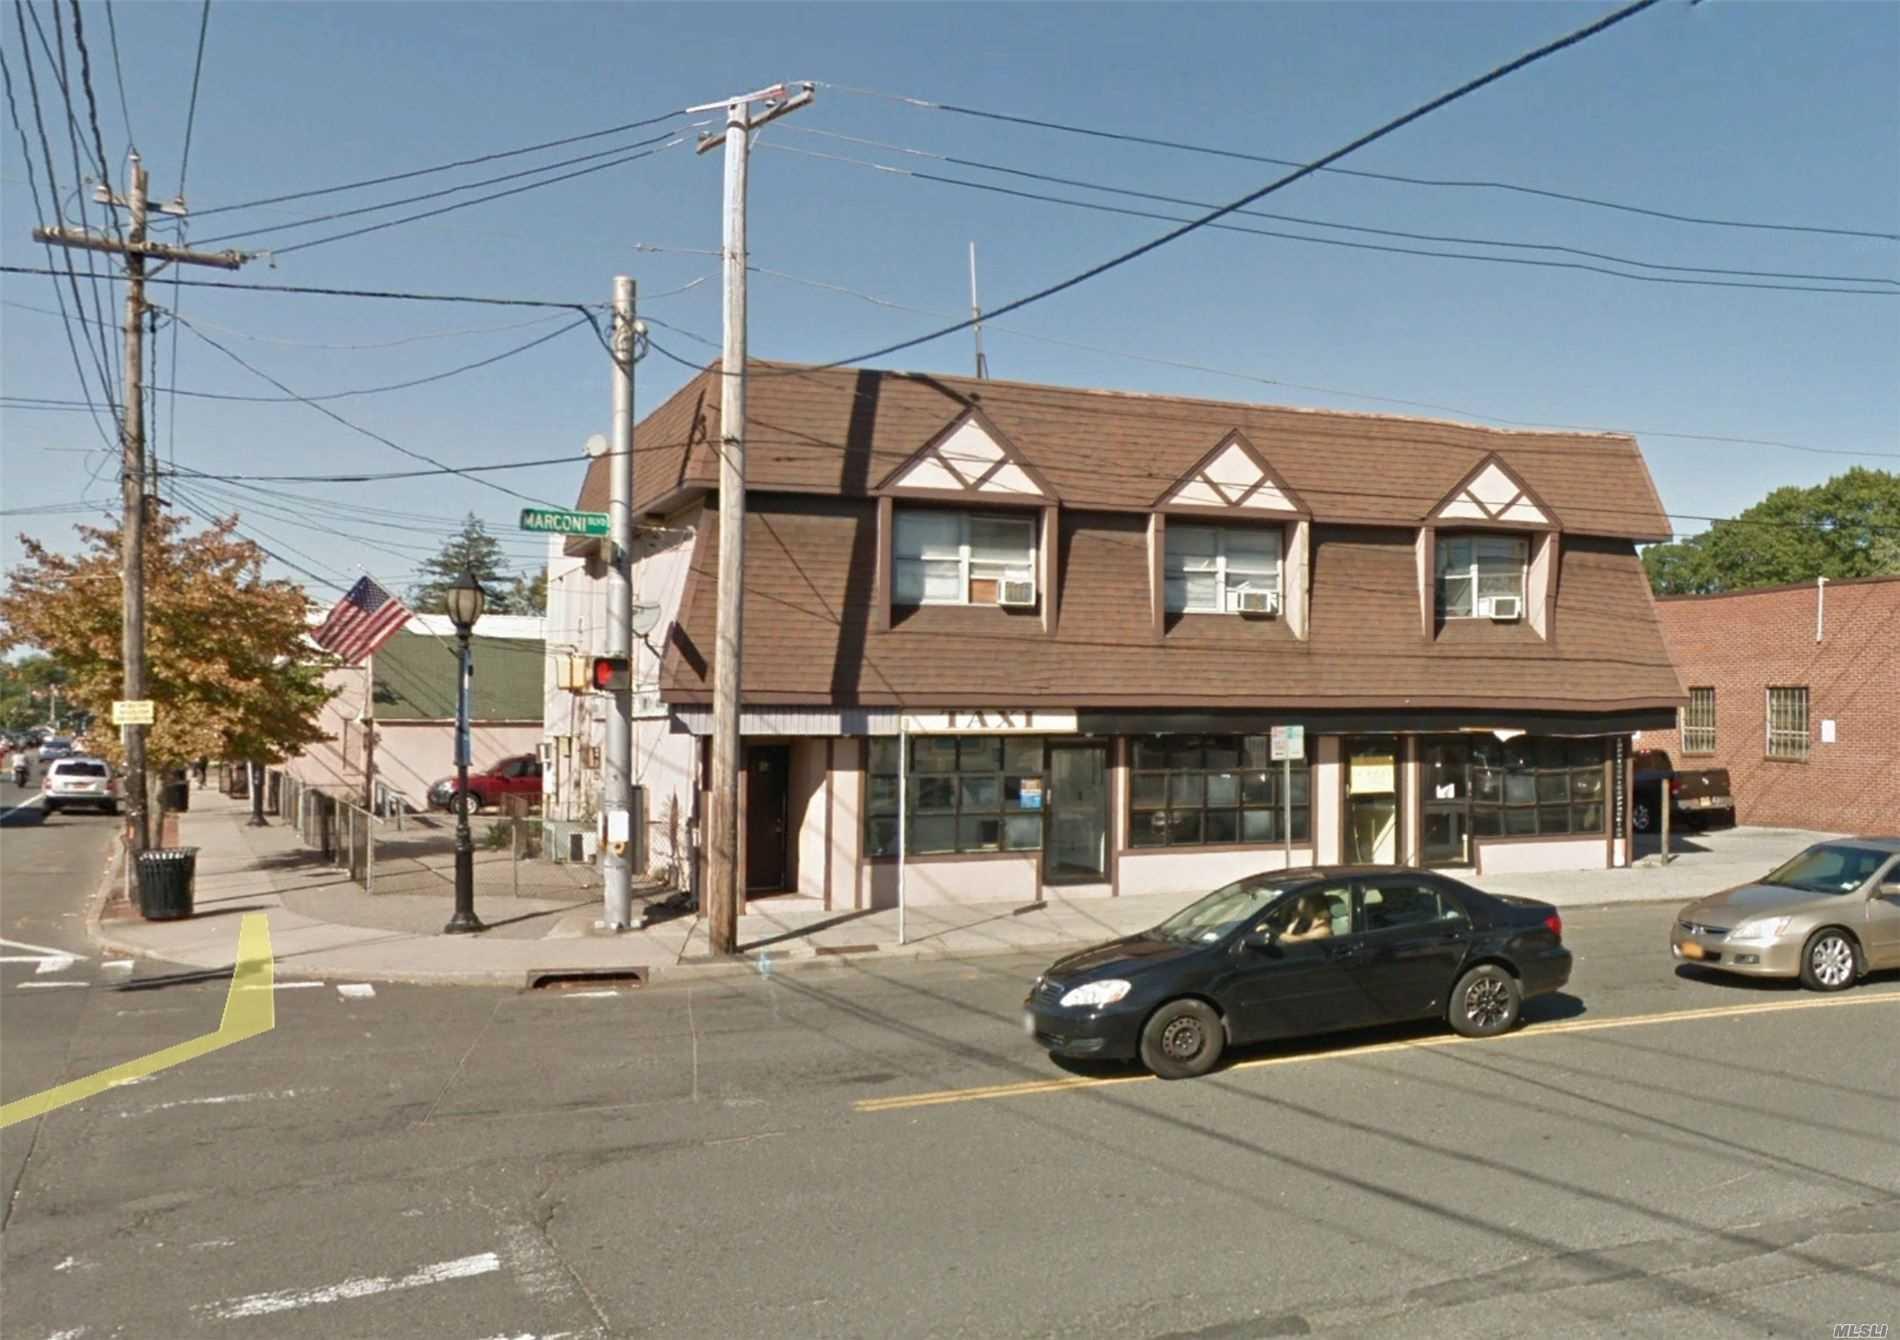 603 Marconi Blvd - Copiague, New York